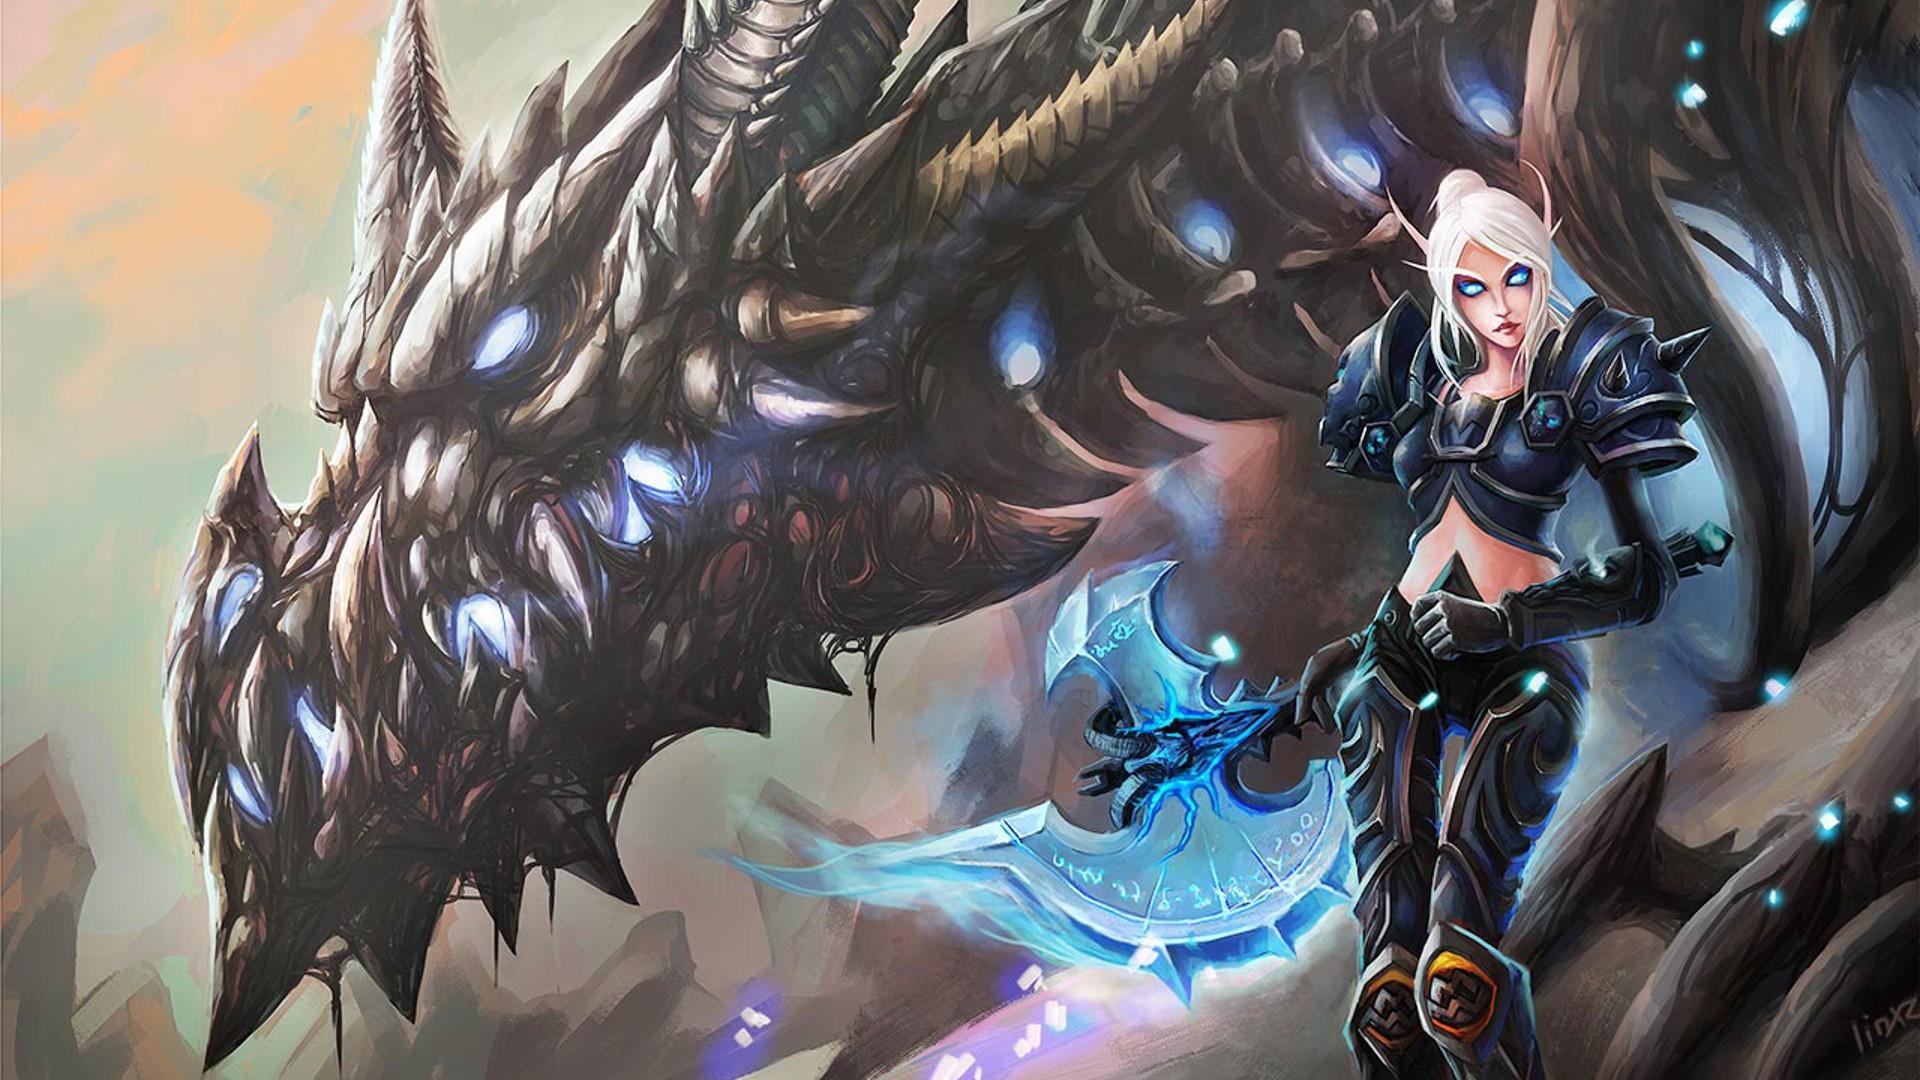 Anime 1920x1080 World of Warcraft dragon blood elves death knights Sindragosa video game girls PC gaming creature video game art blue eyes blonde axes women glowing eyes standing fantasy art fantasy girl